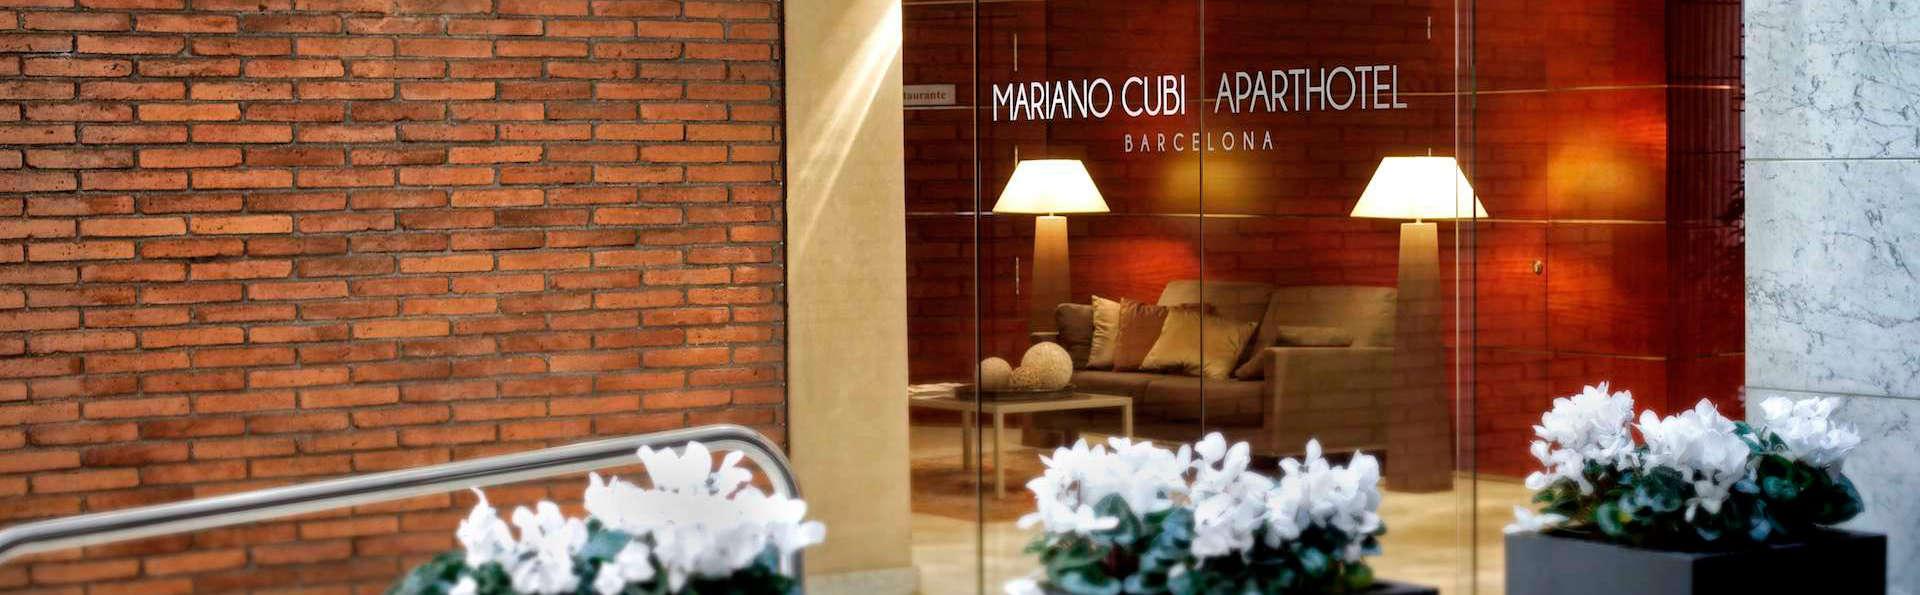 Aparthotel Mariano Cubi Barcelona - EDIT_front.jpg